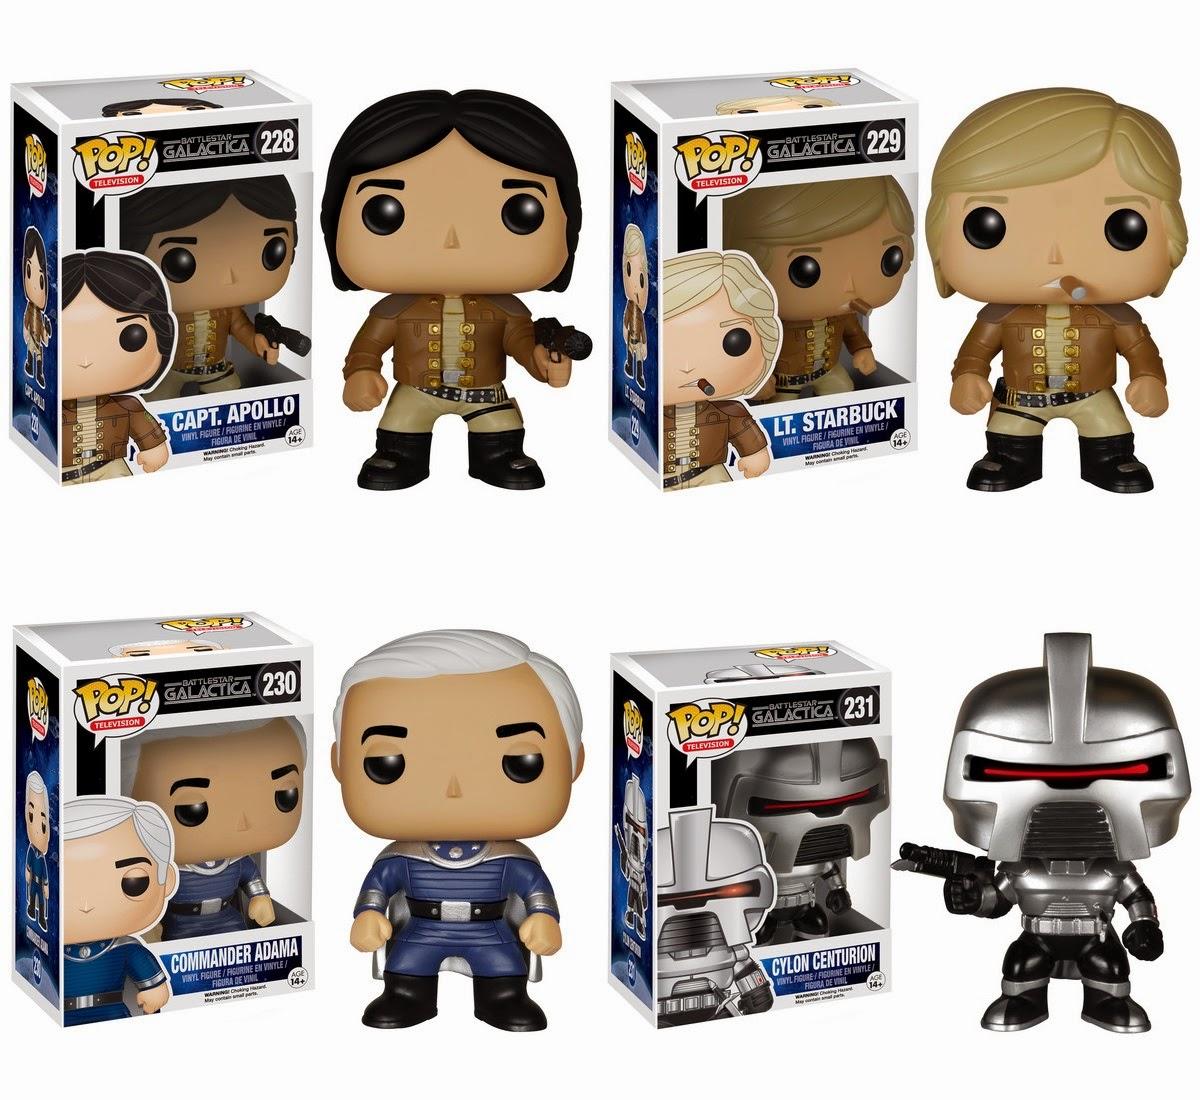 Battlestar Galactica Pop! Series 1 Vinyl Figures by Funko - Capt. Apollo, Lt. Starbuck, Commander Adama & a Cylon Centurion